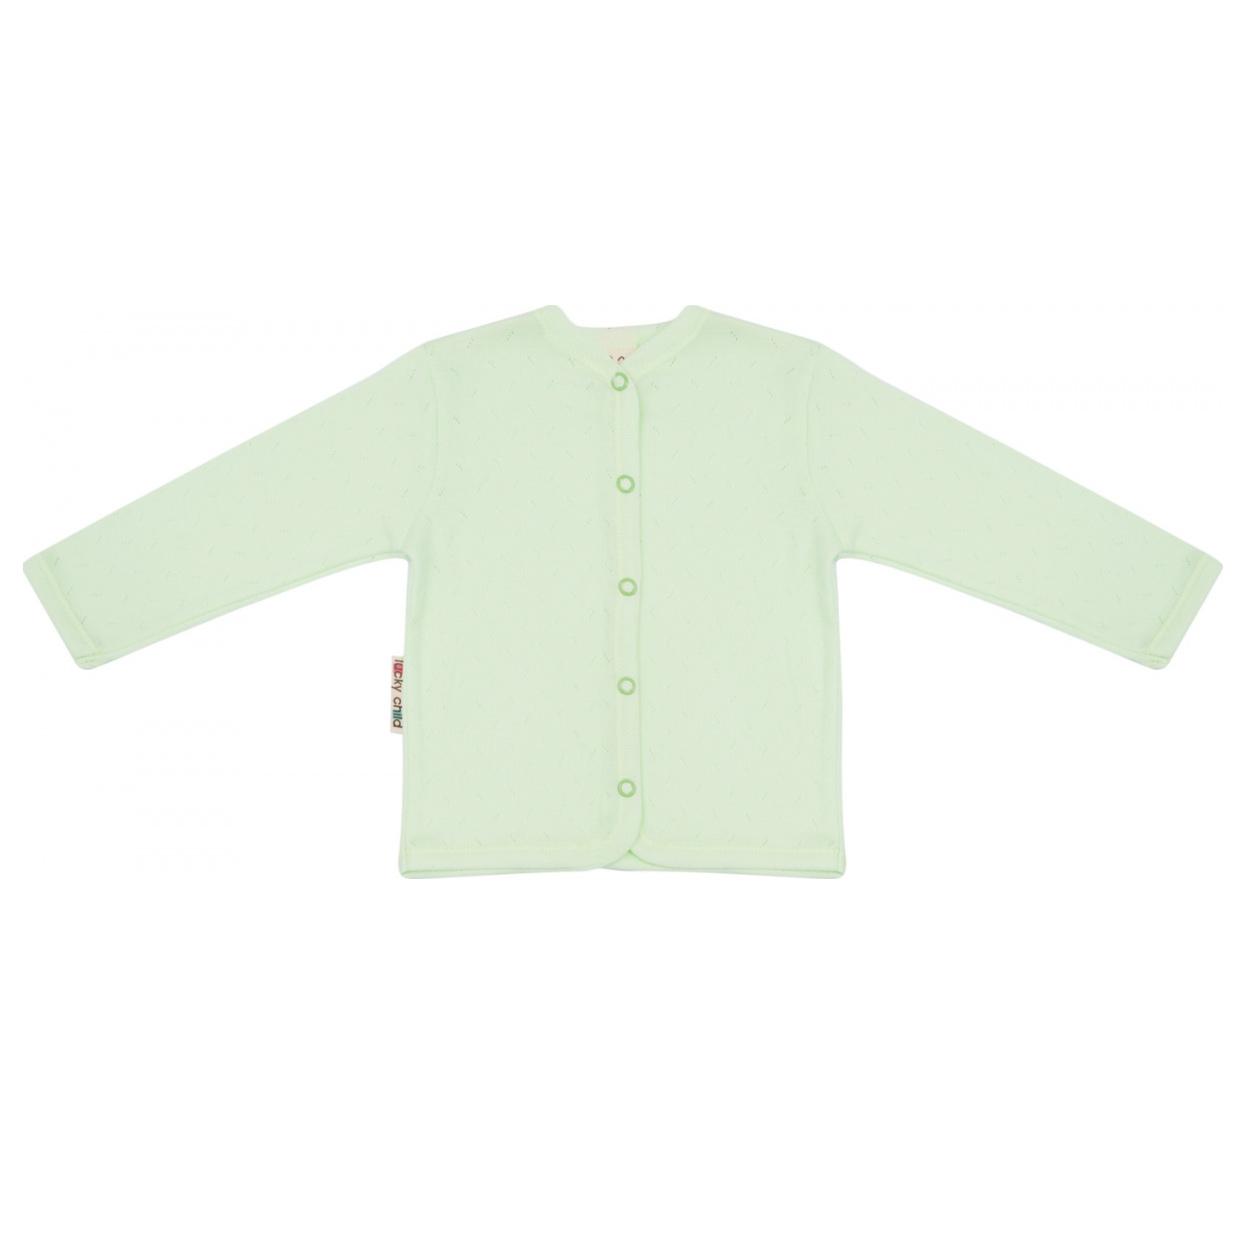 Фото - Кофта Lucky Child Ажур зеленая 74-80 футболка lucky child ажур белая 74 80